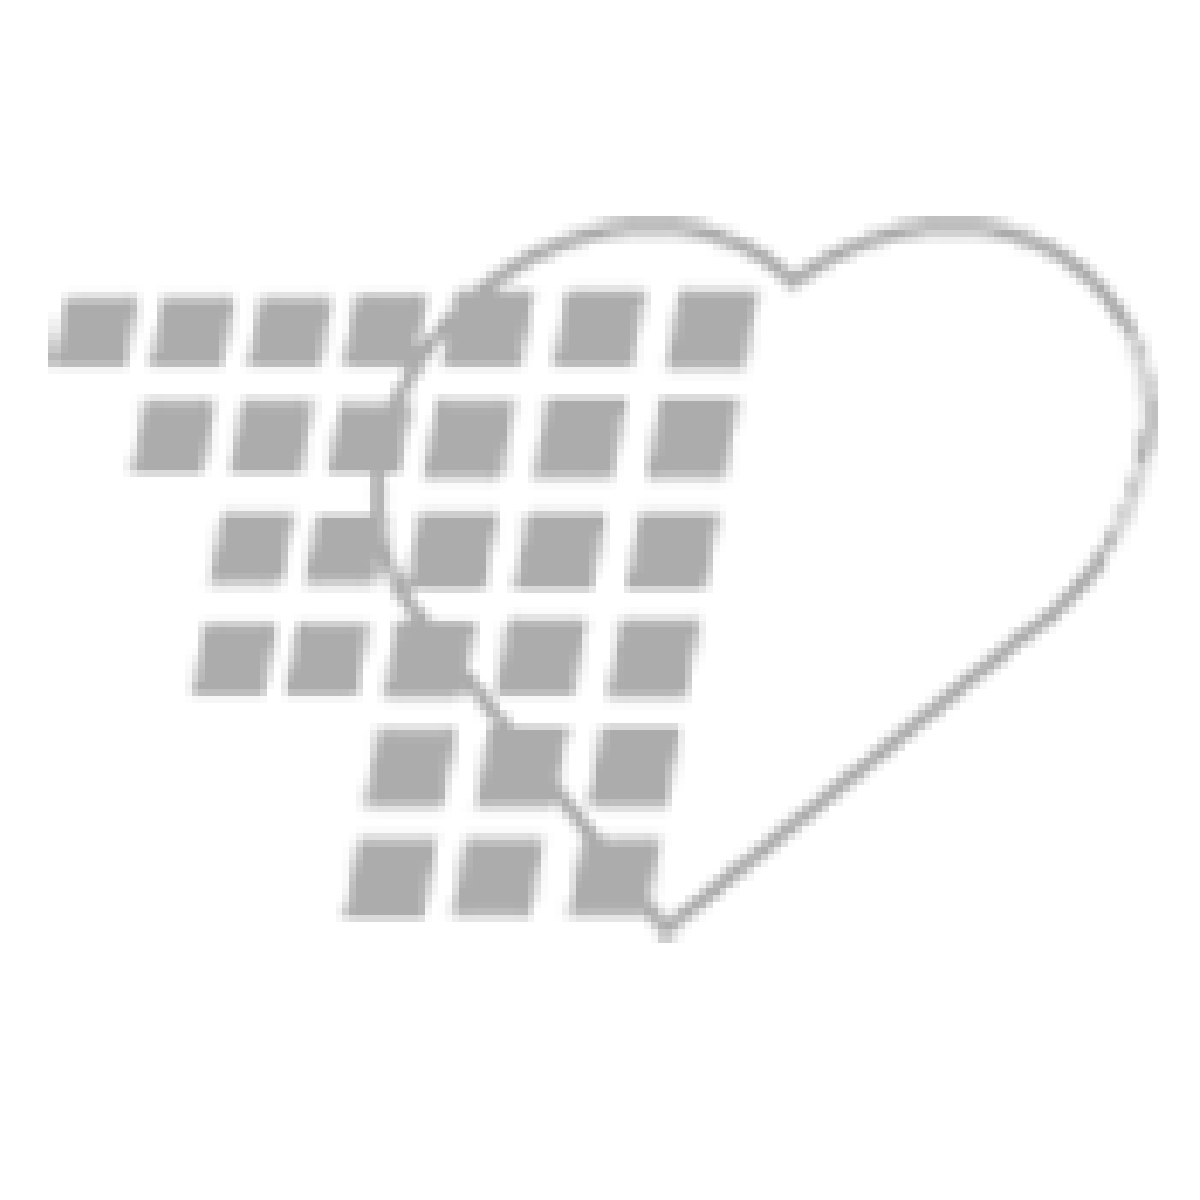 12-81-2121 Simulaids Sani-Baby CPR Manikin